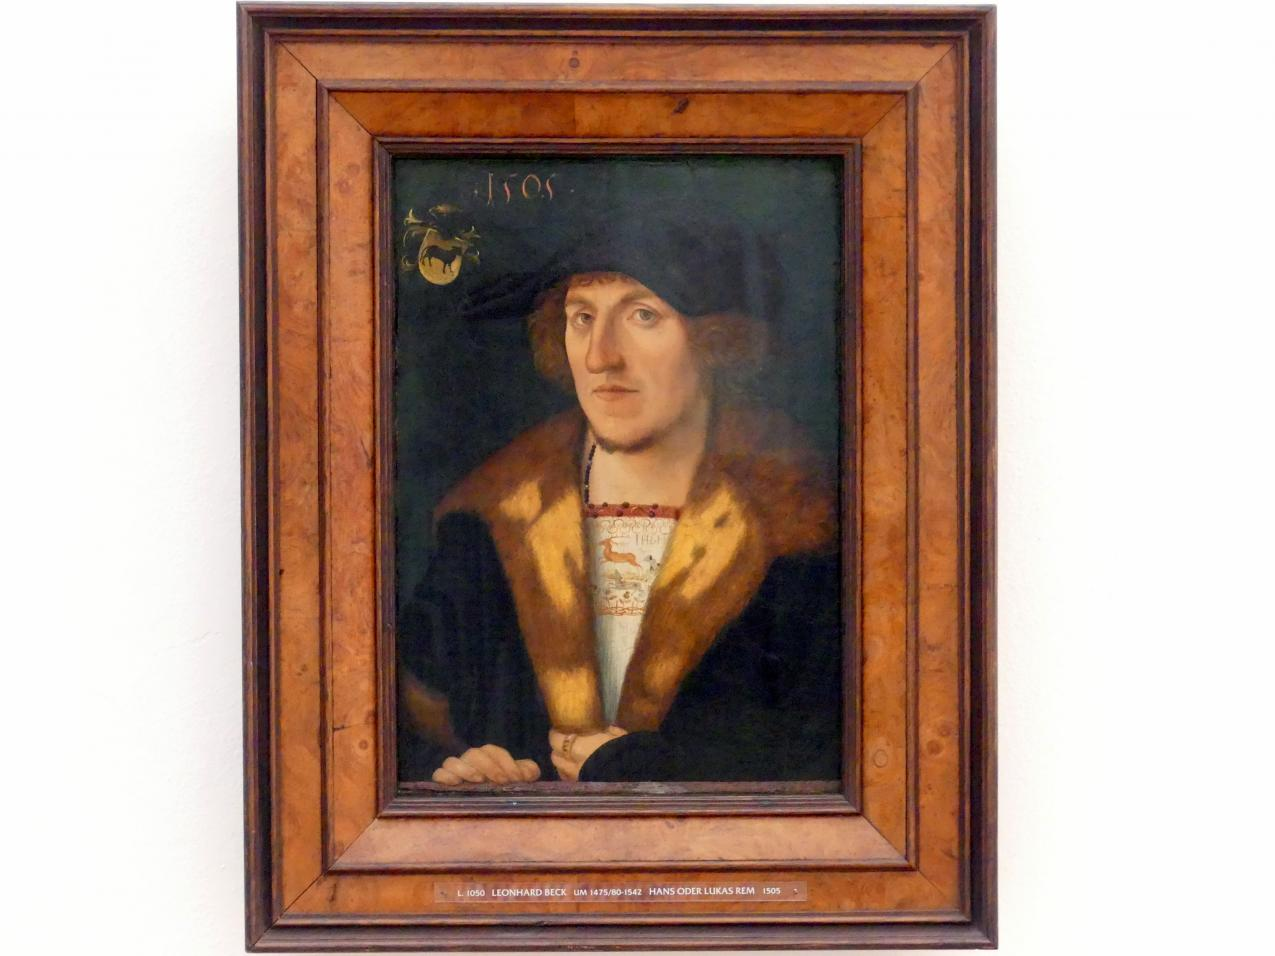 Leonhard Beck: Bildnis Hans oder Lukas Rem, 1505